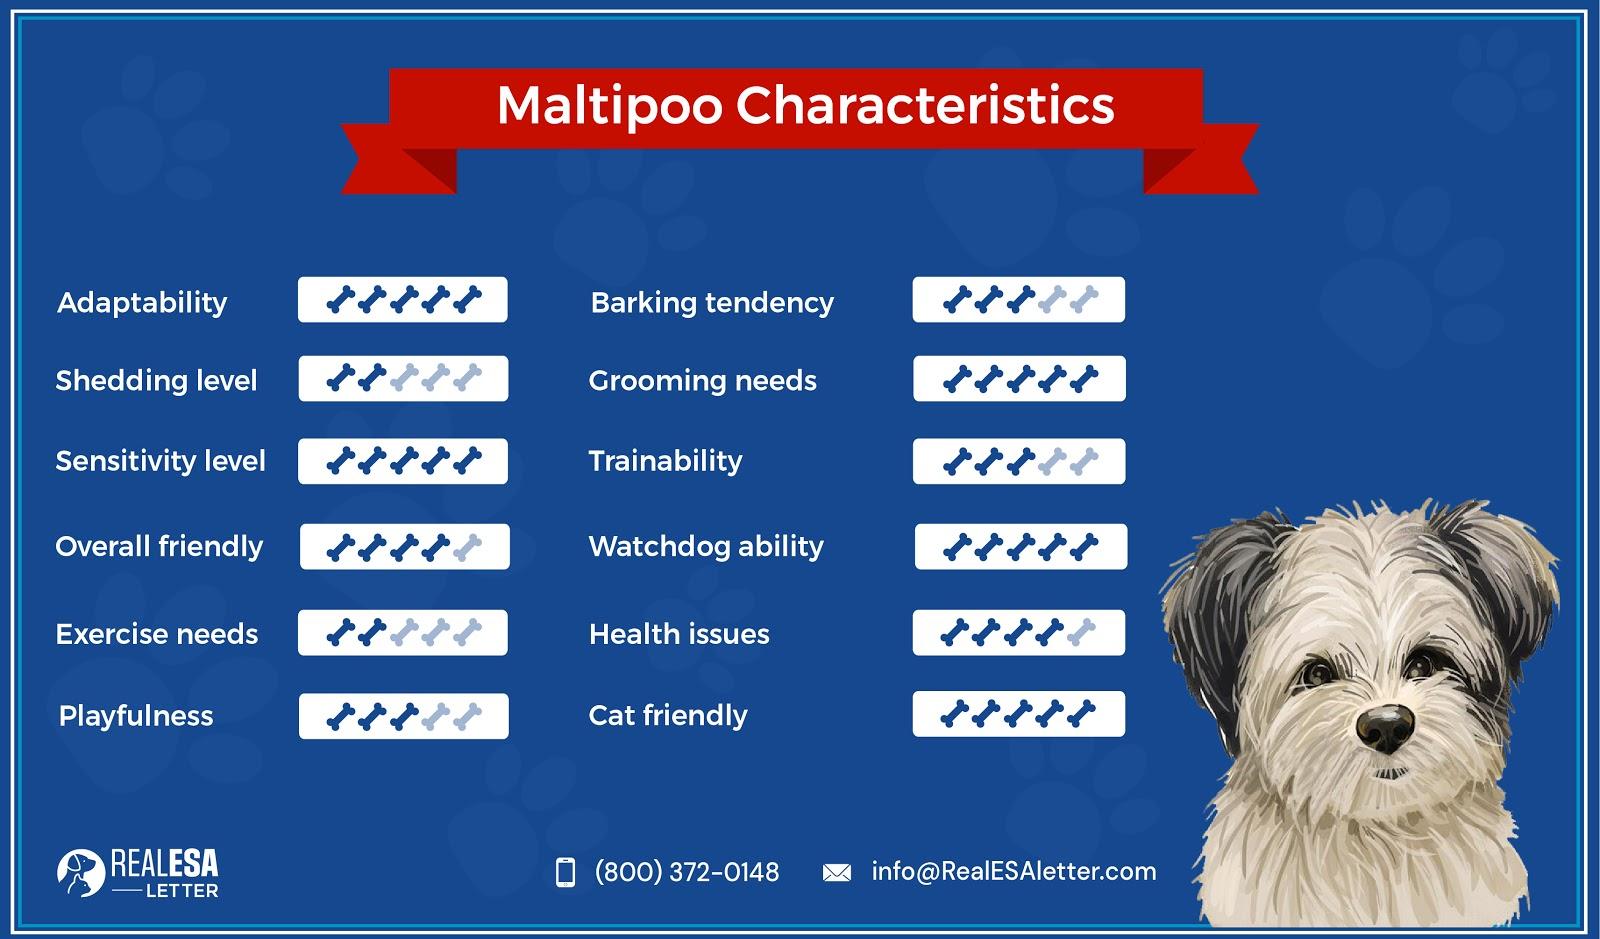 maltipoo characteristics